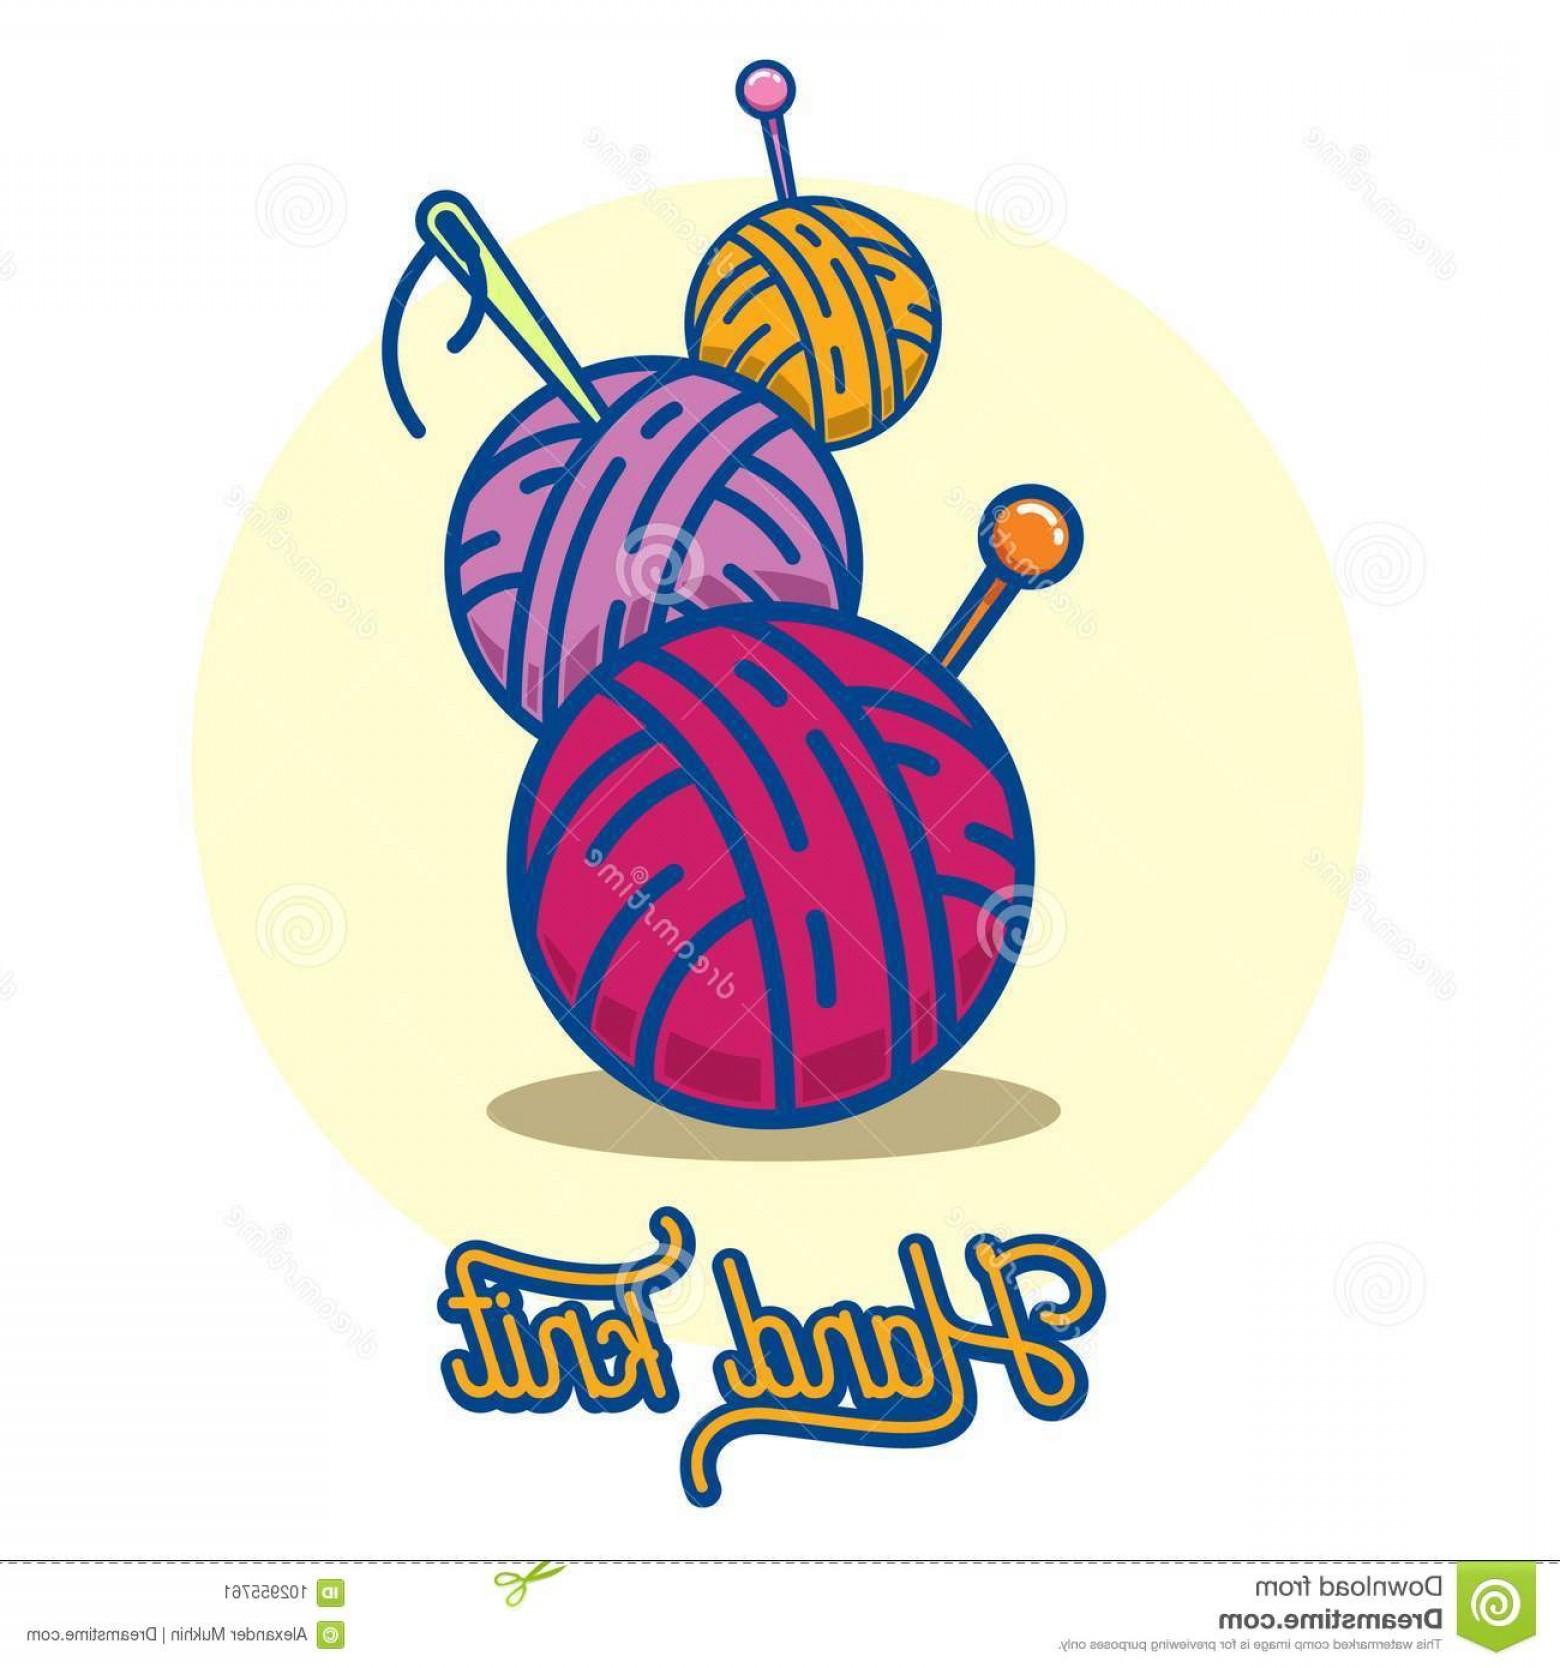 1560x1668 Balls Yarn Vector Icon Logo Handmade Image Shopatcloth